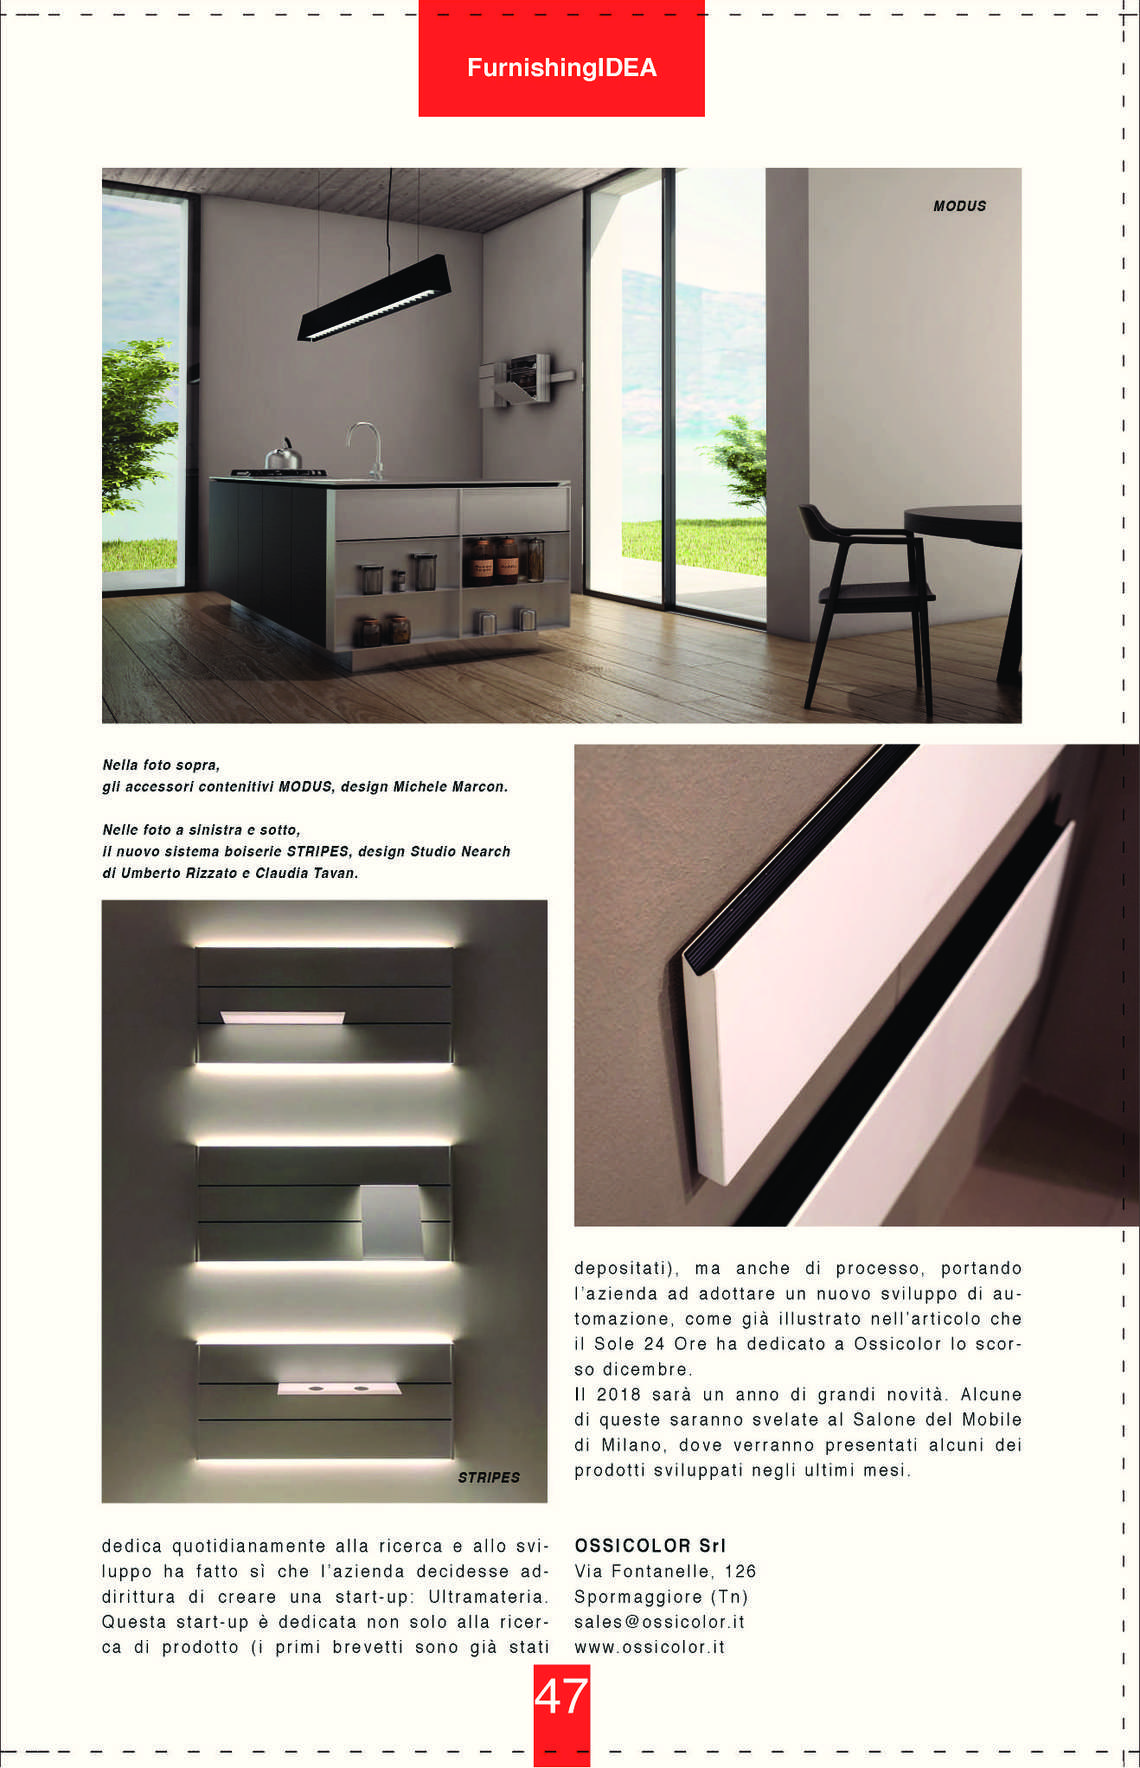 furnishing-idea-journal--1-2018_journal_9_046.jpg